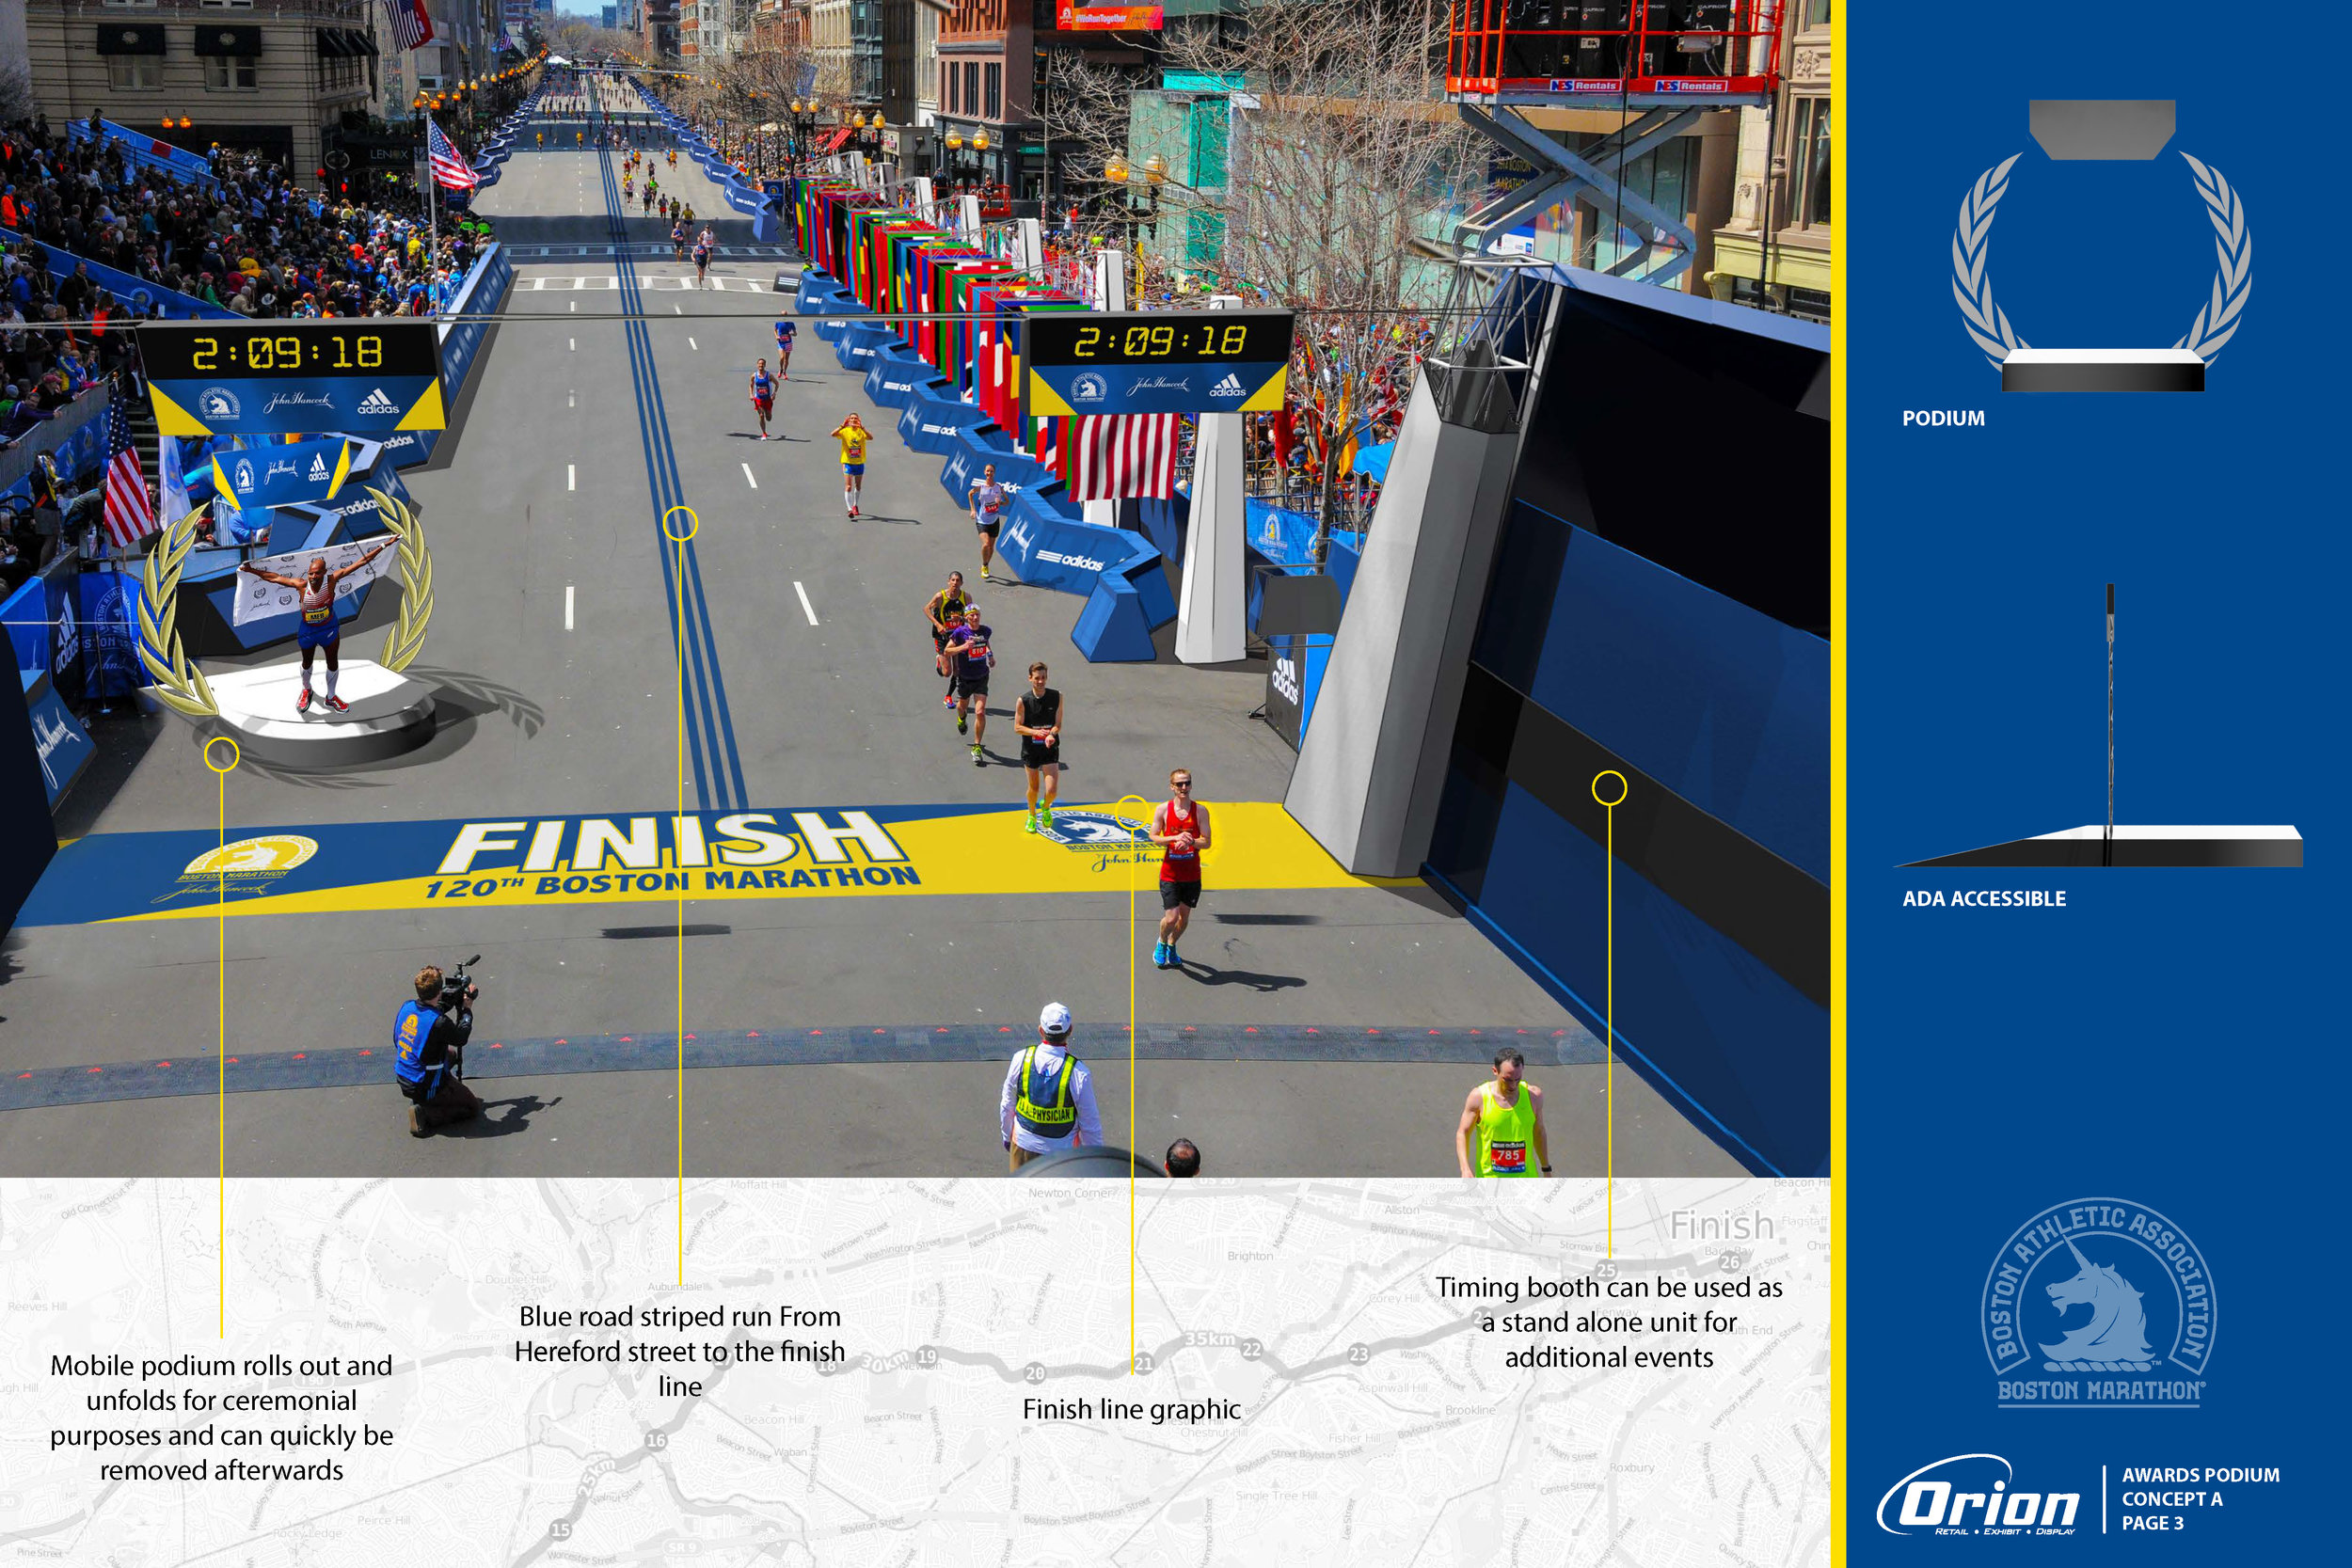 BostonMarathon%20Presentation_Concept%20A 1_Page_3.jpg